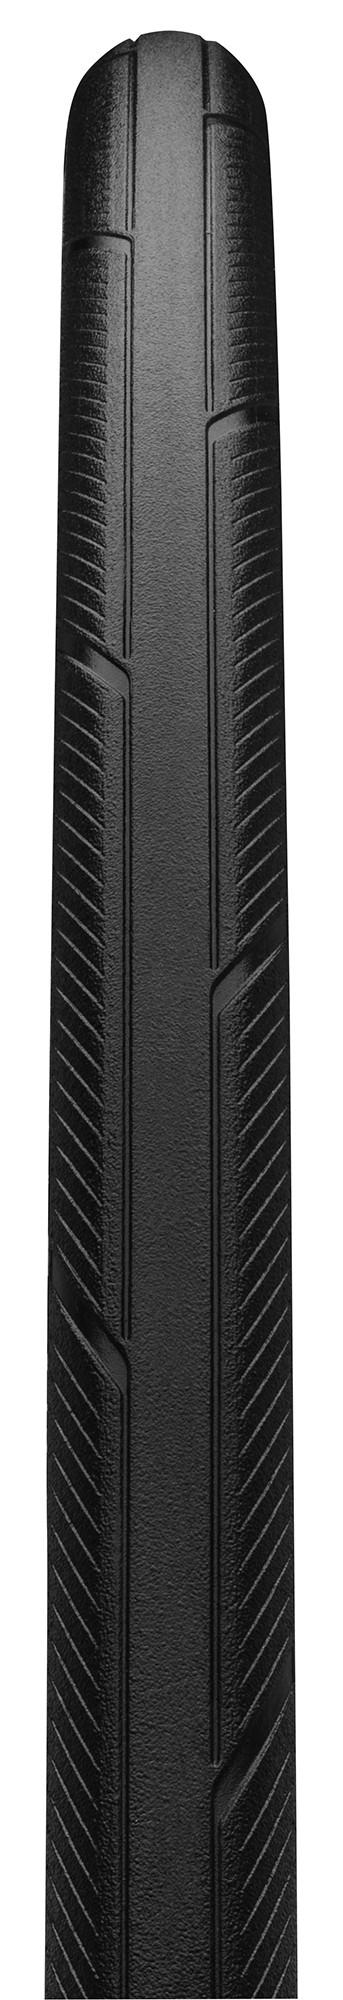 Anvelopa pliabila Continental UltraSport III 28-622 negru/negru - Wheelsports